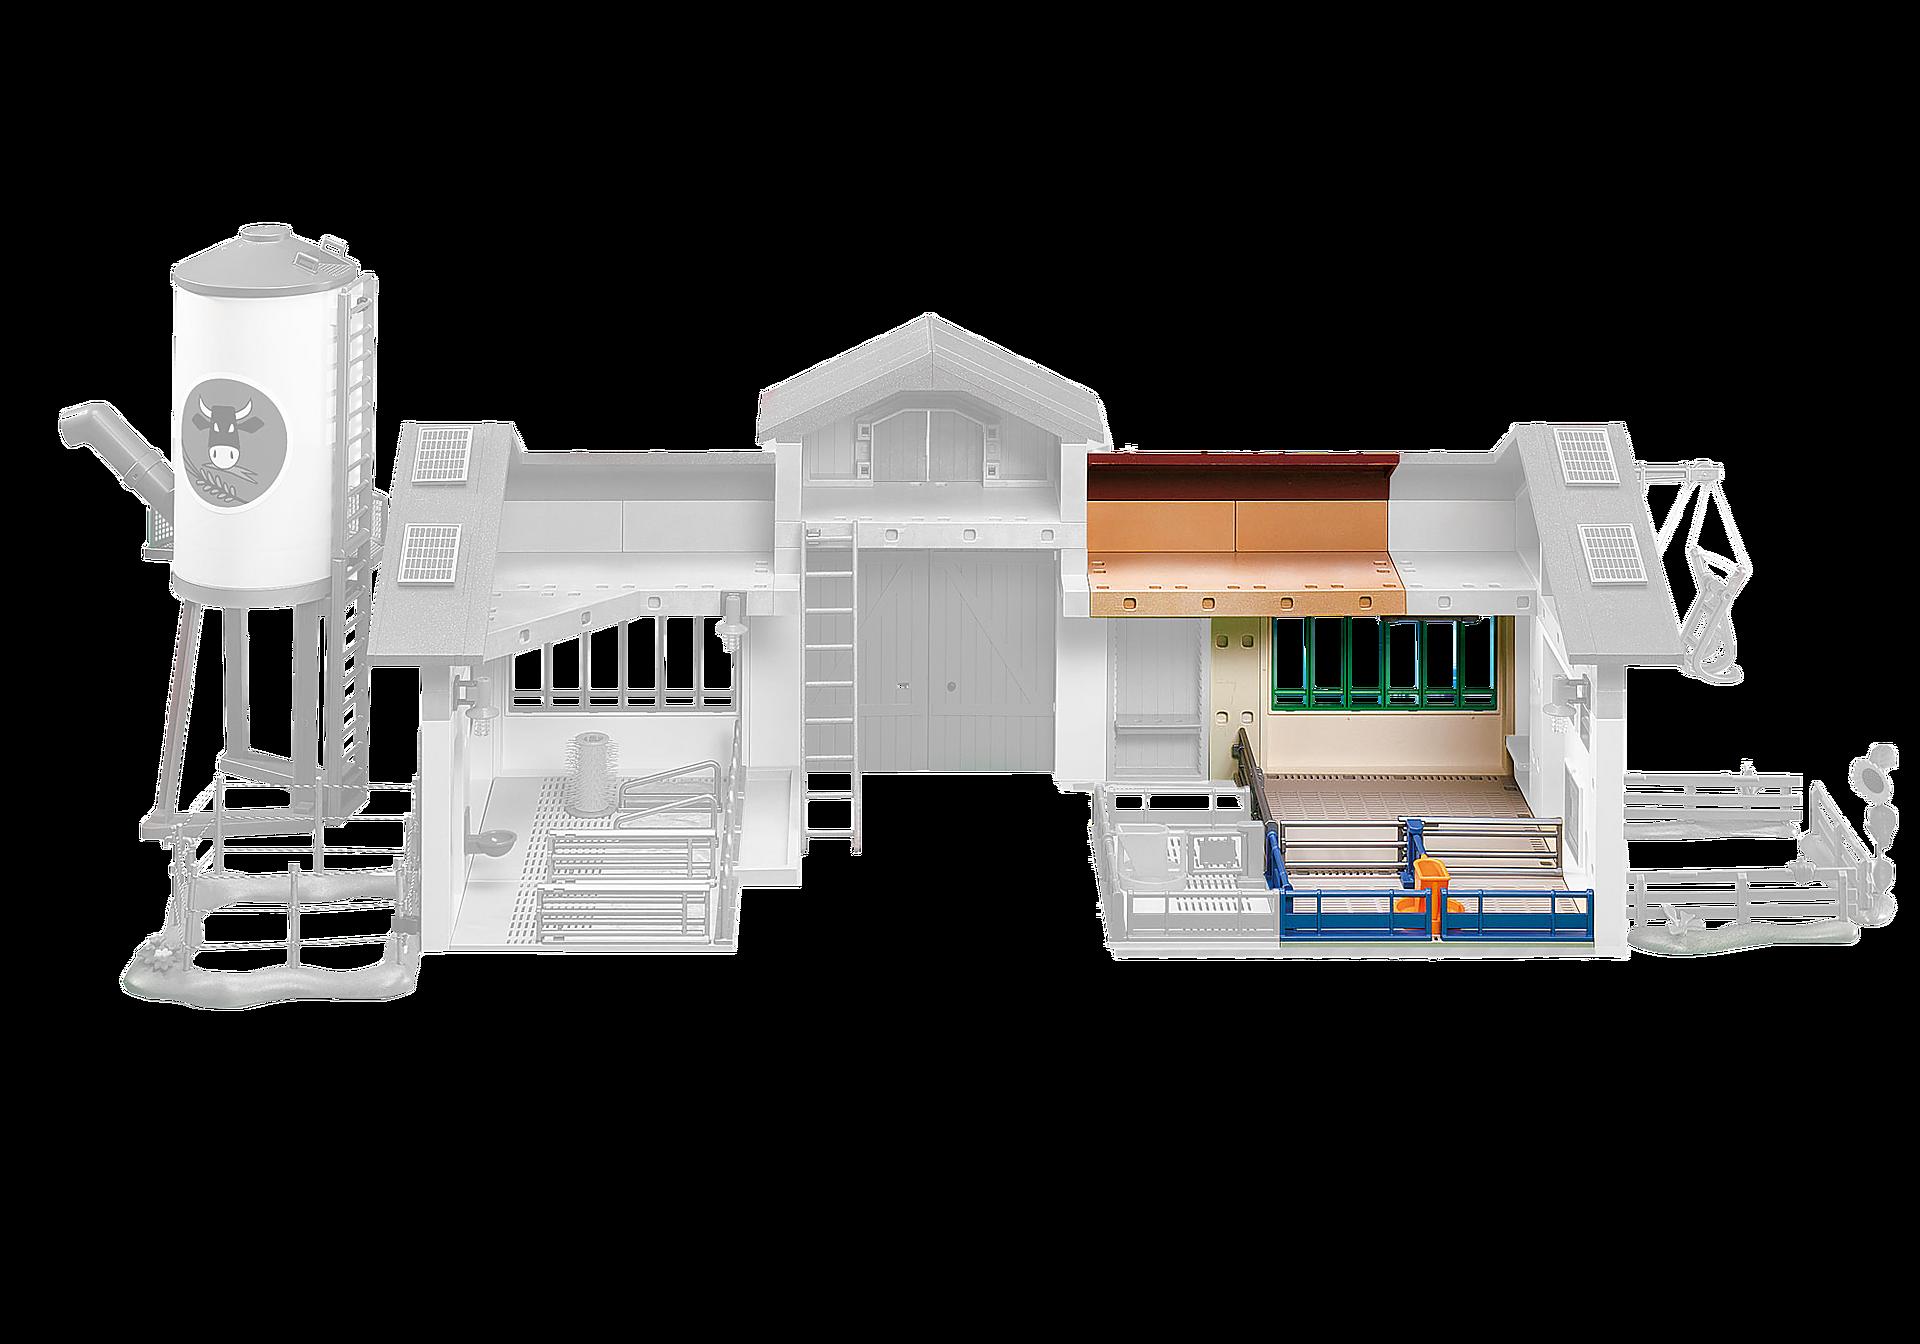 http://media.playmobil.com/i/playmobil/6209_product_detail/Stallerweiterung Neuer Bauernhof